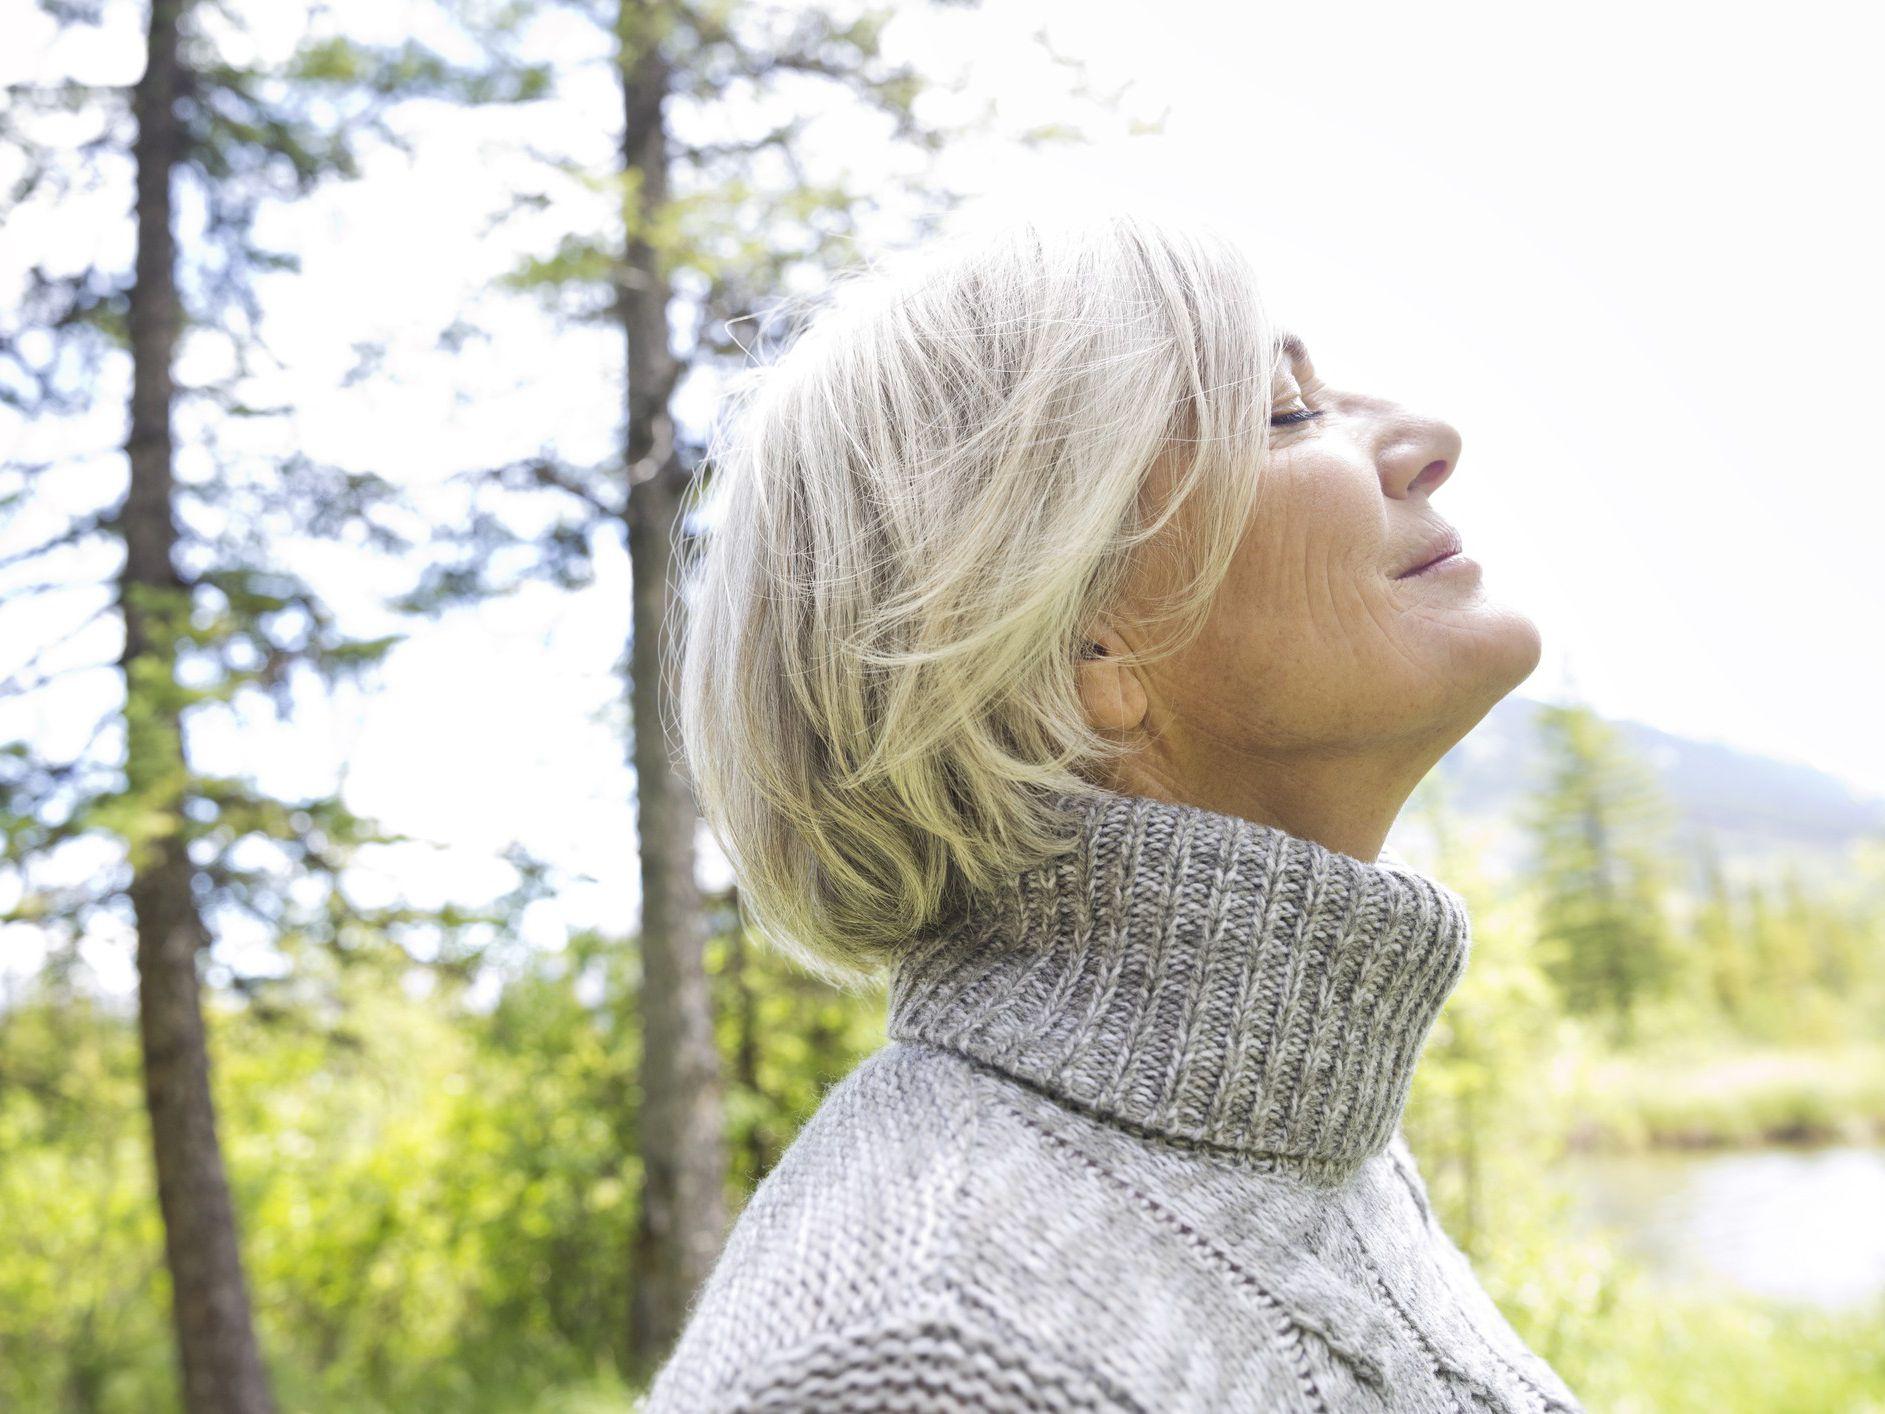 GABA and Glutamate Dysregulation: Fibromyalgia and CFS